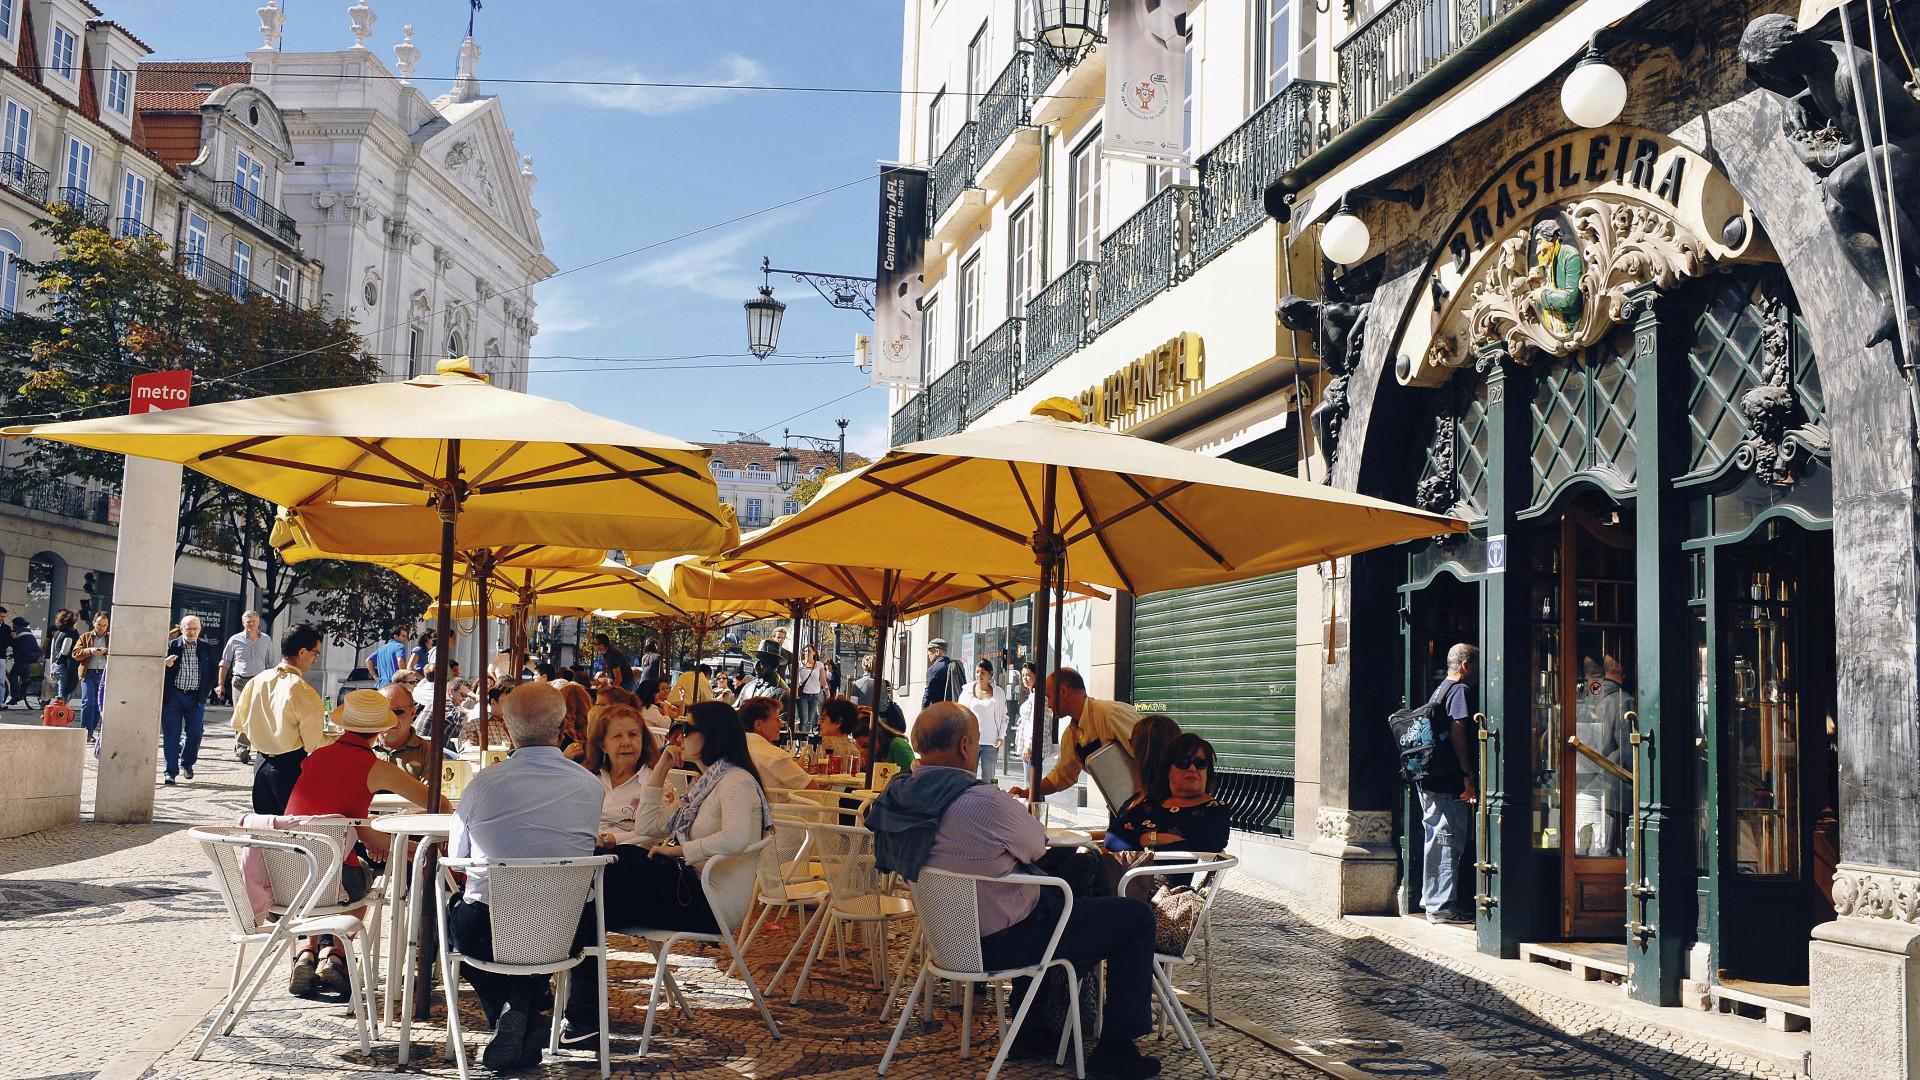 People eating al fresco in Lisbon's Chiado district